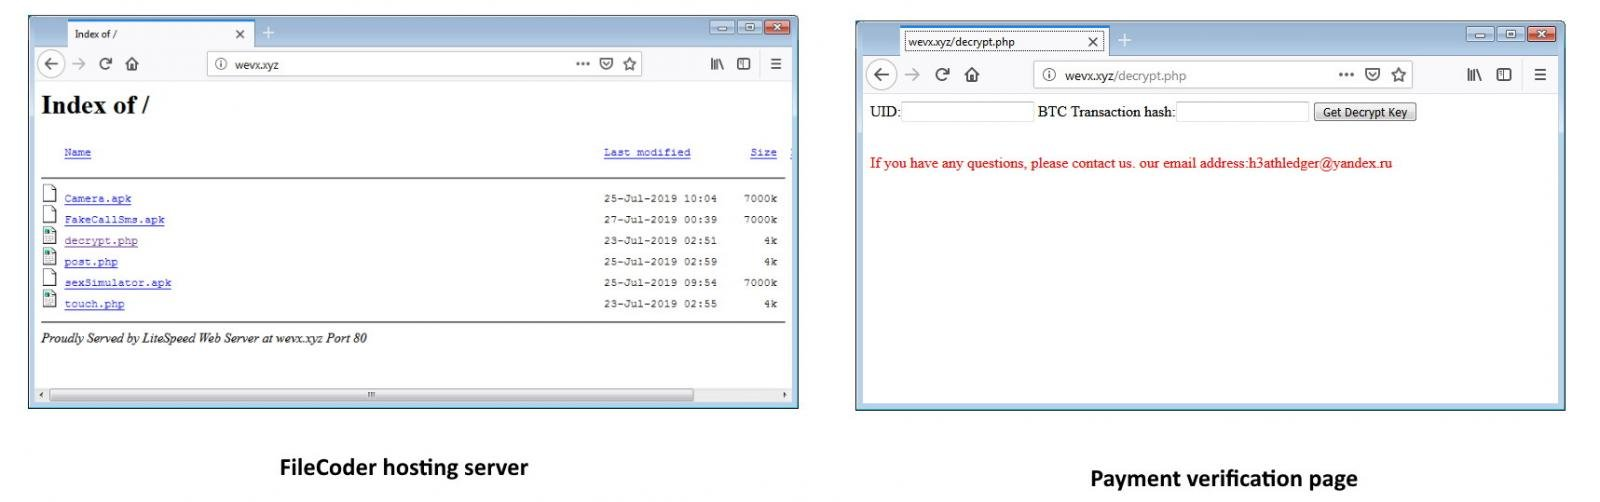 FileCoder server